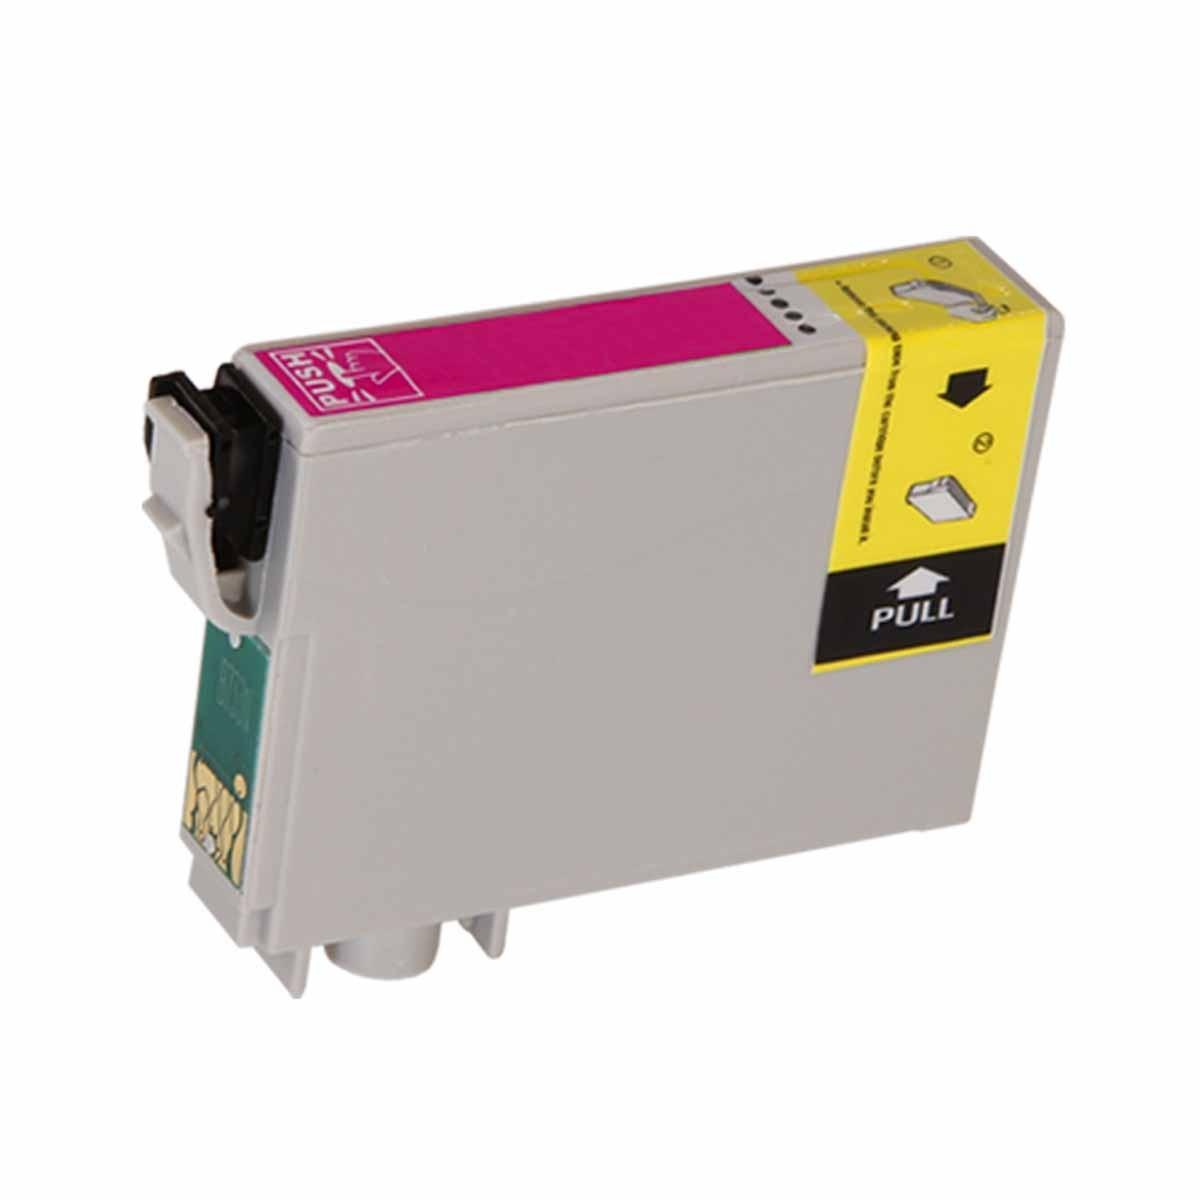 CARTUCHO EPSON T082320 T082 T0823 - R290/R270/R390/RX590/T50 MAGENTA (COMPATÍVEL)